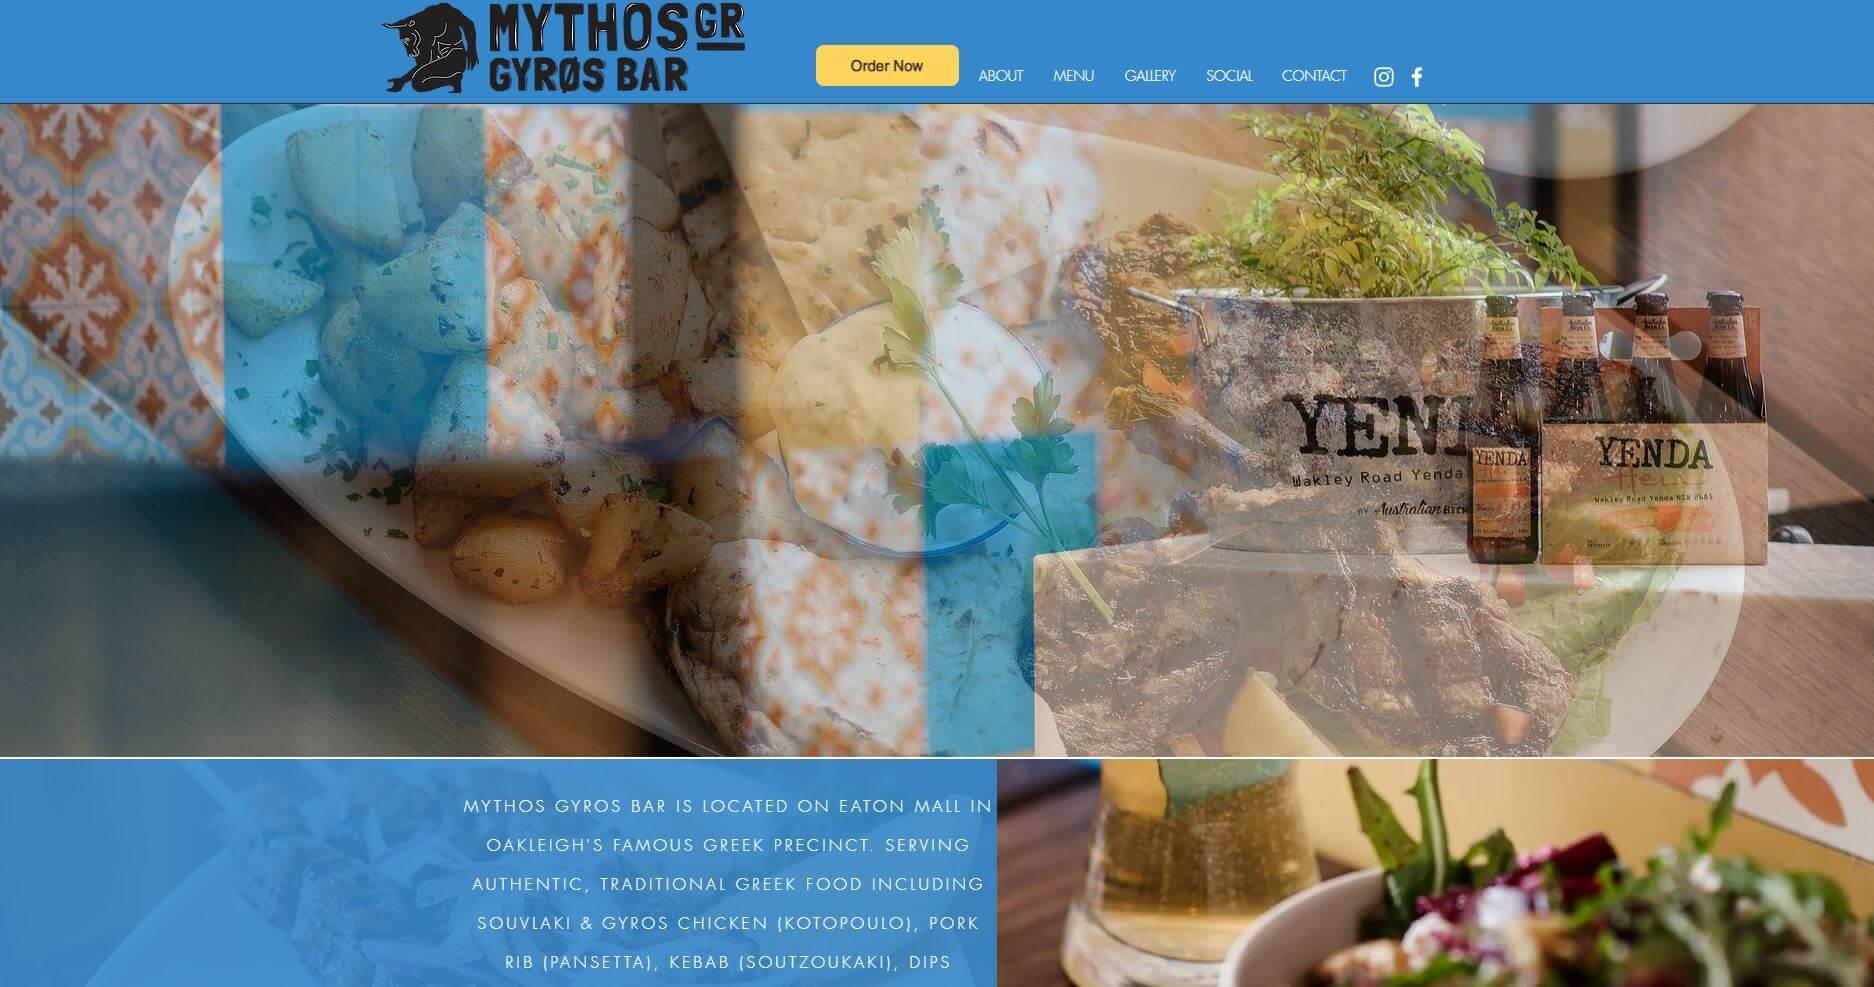 Myths Gyros Bar